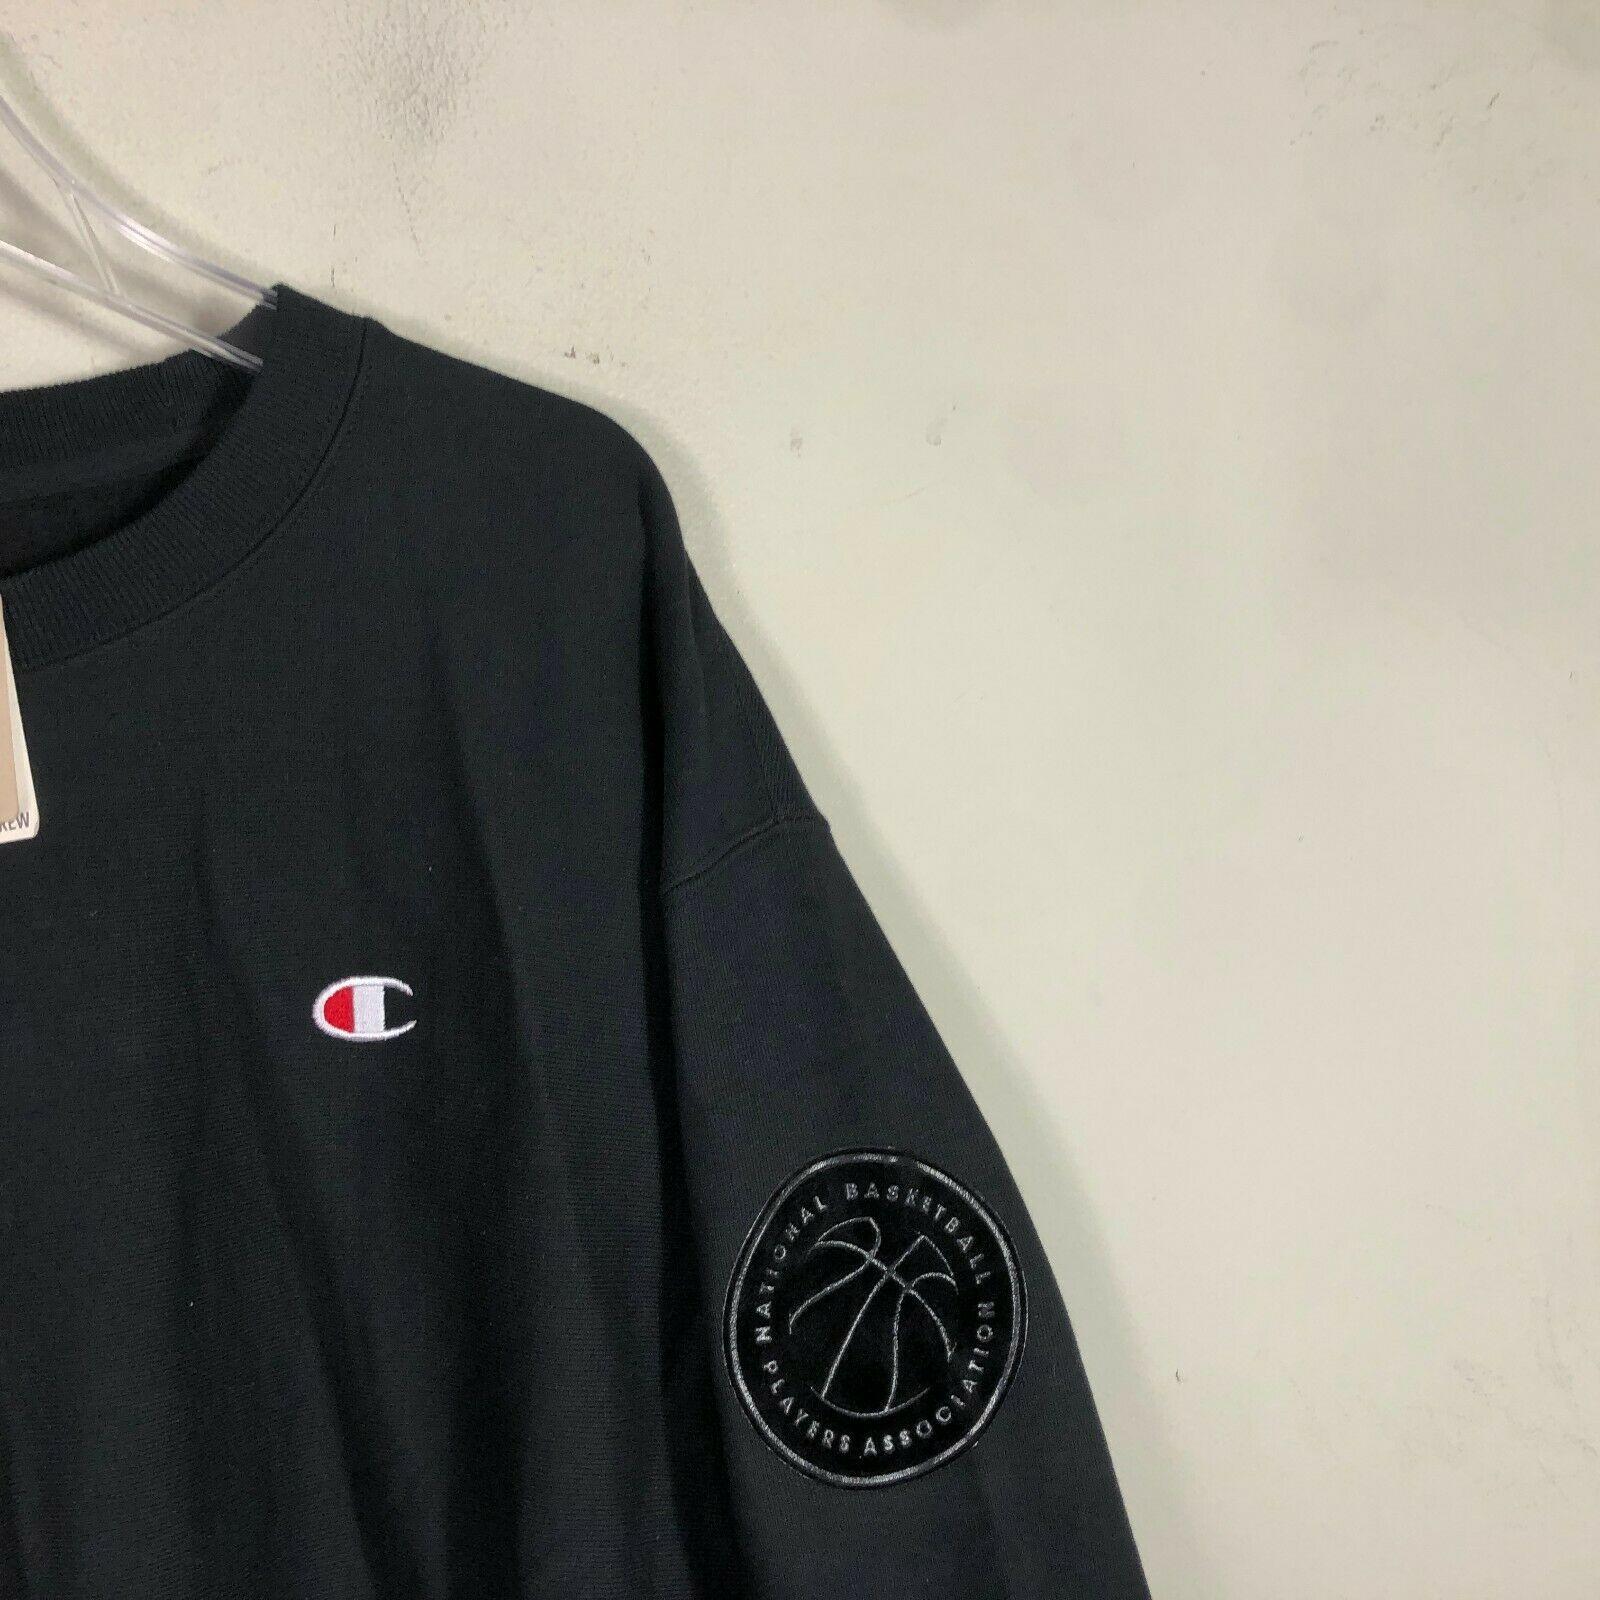 Vintage Champion Crew Neck Reverse Weave Sweatshirt 2XL NBA NBPA Sweatshirt NWT image 6